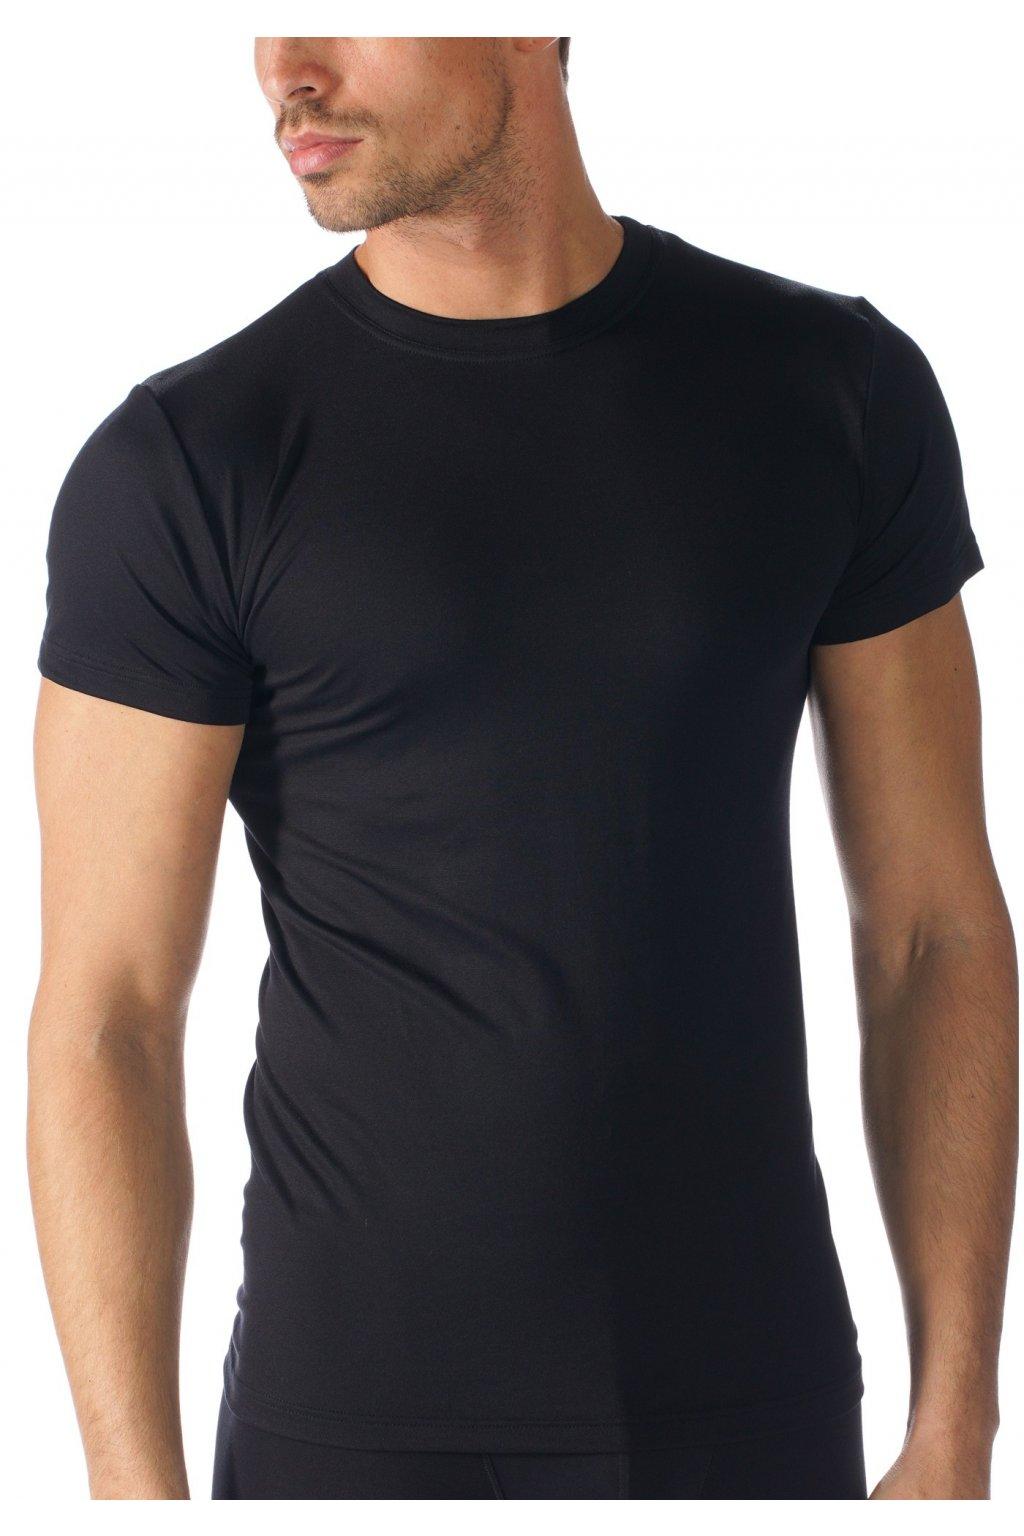 Pánske tričko Mey Software 42503